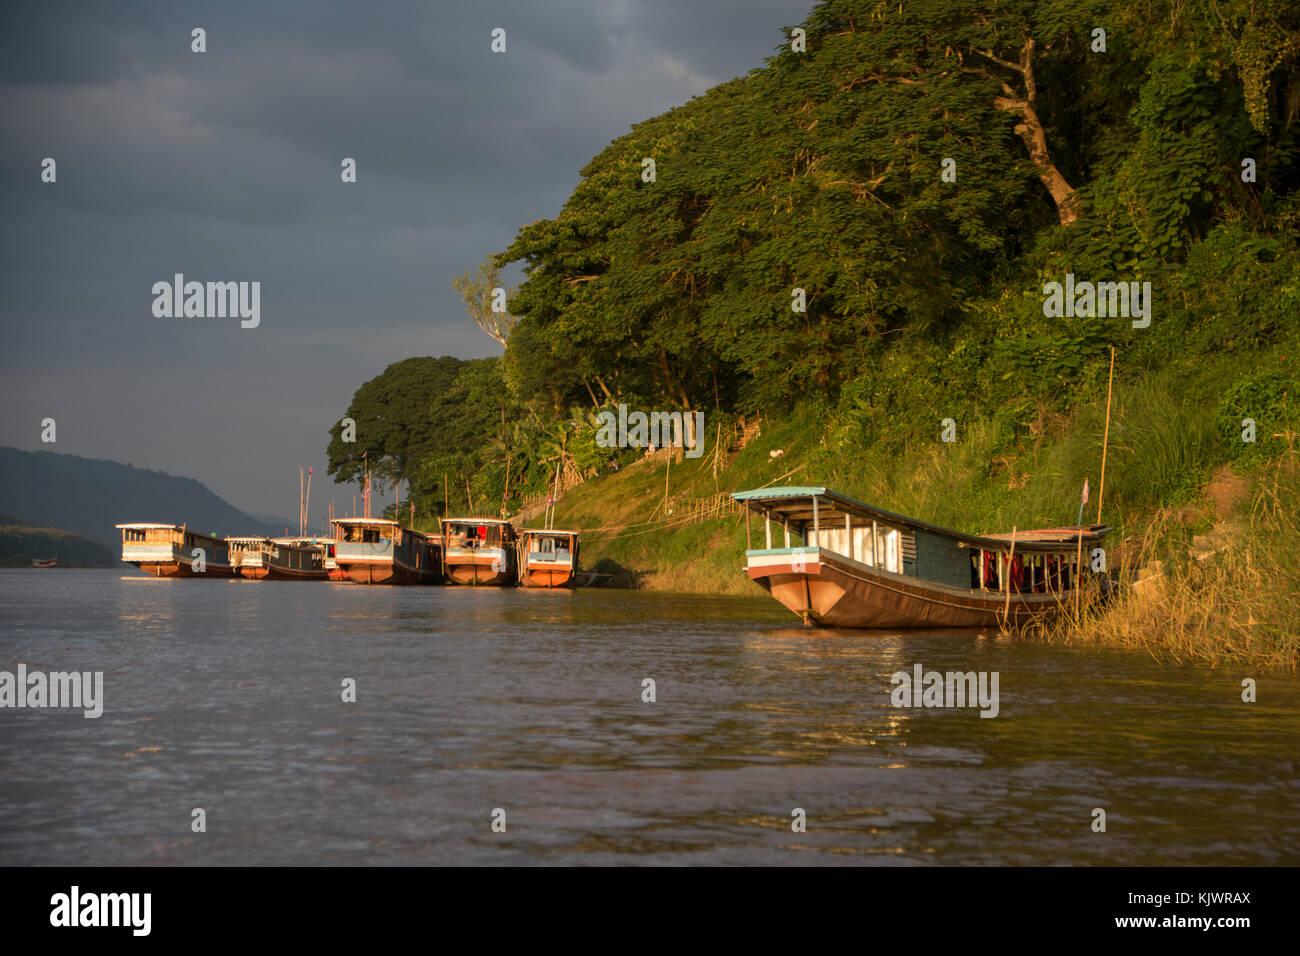 Boote in der Abendsonne am Mekong bei Luang Prabang Stockbild